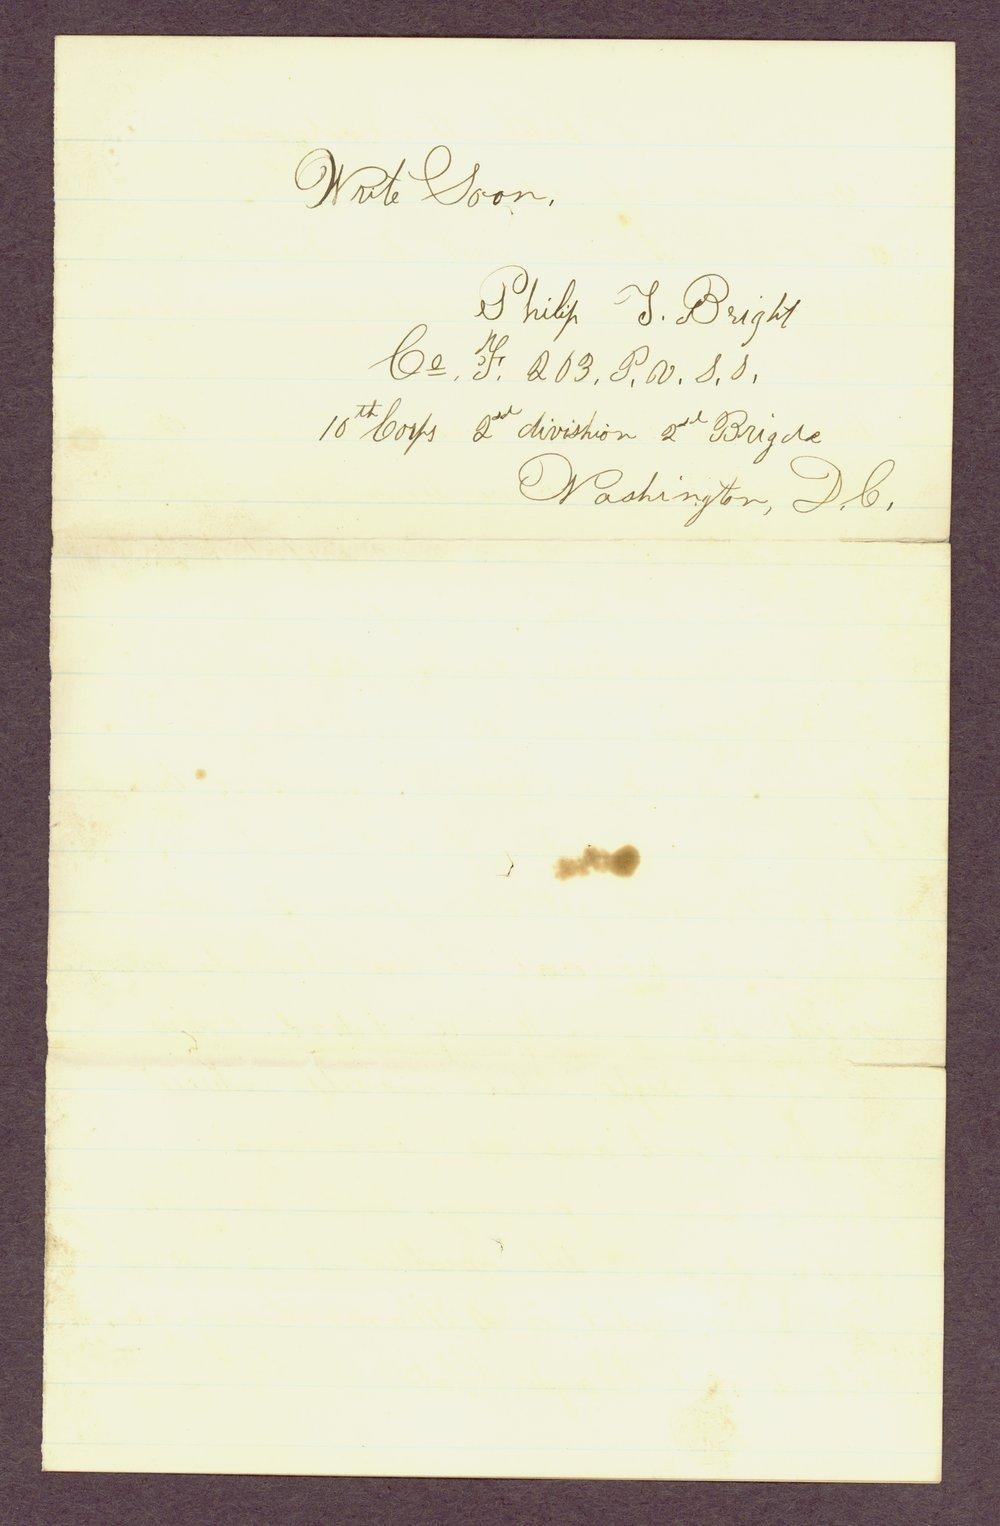 Abbie Bright correspondence - 10